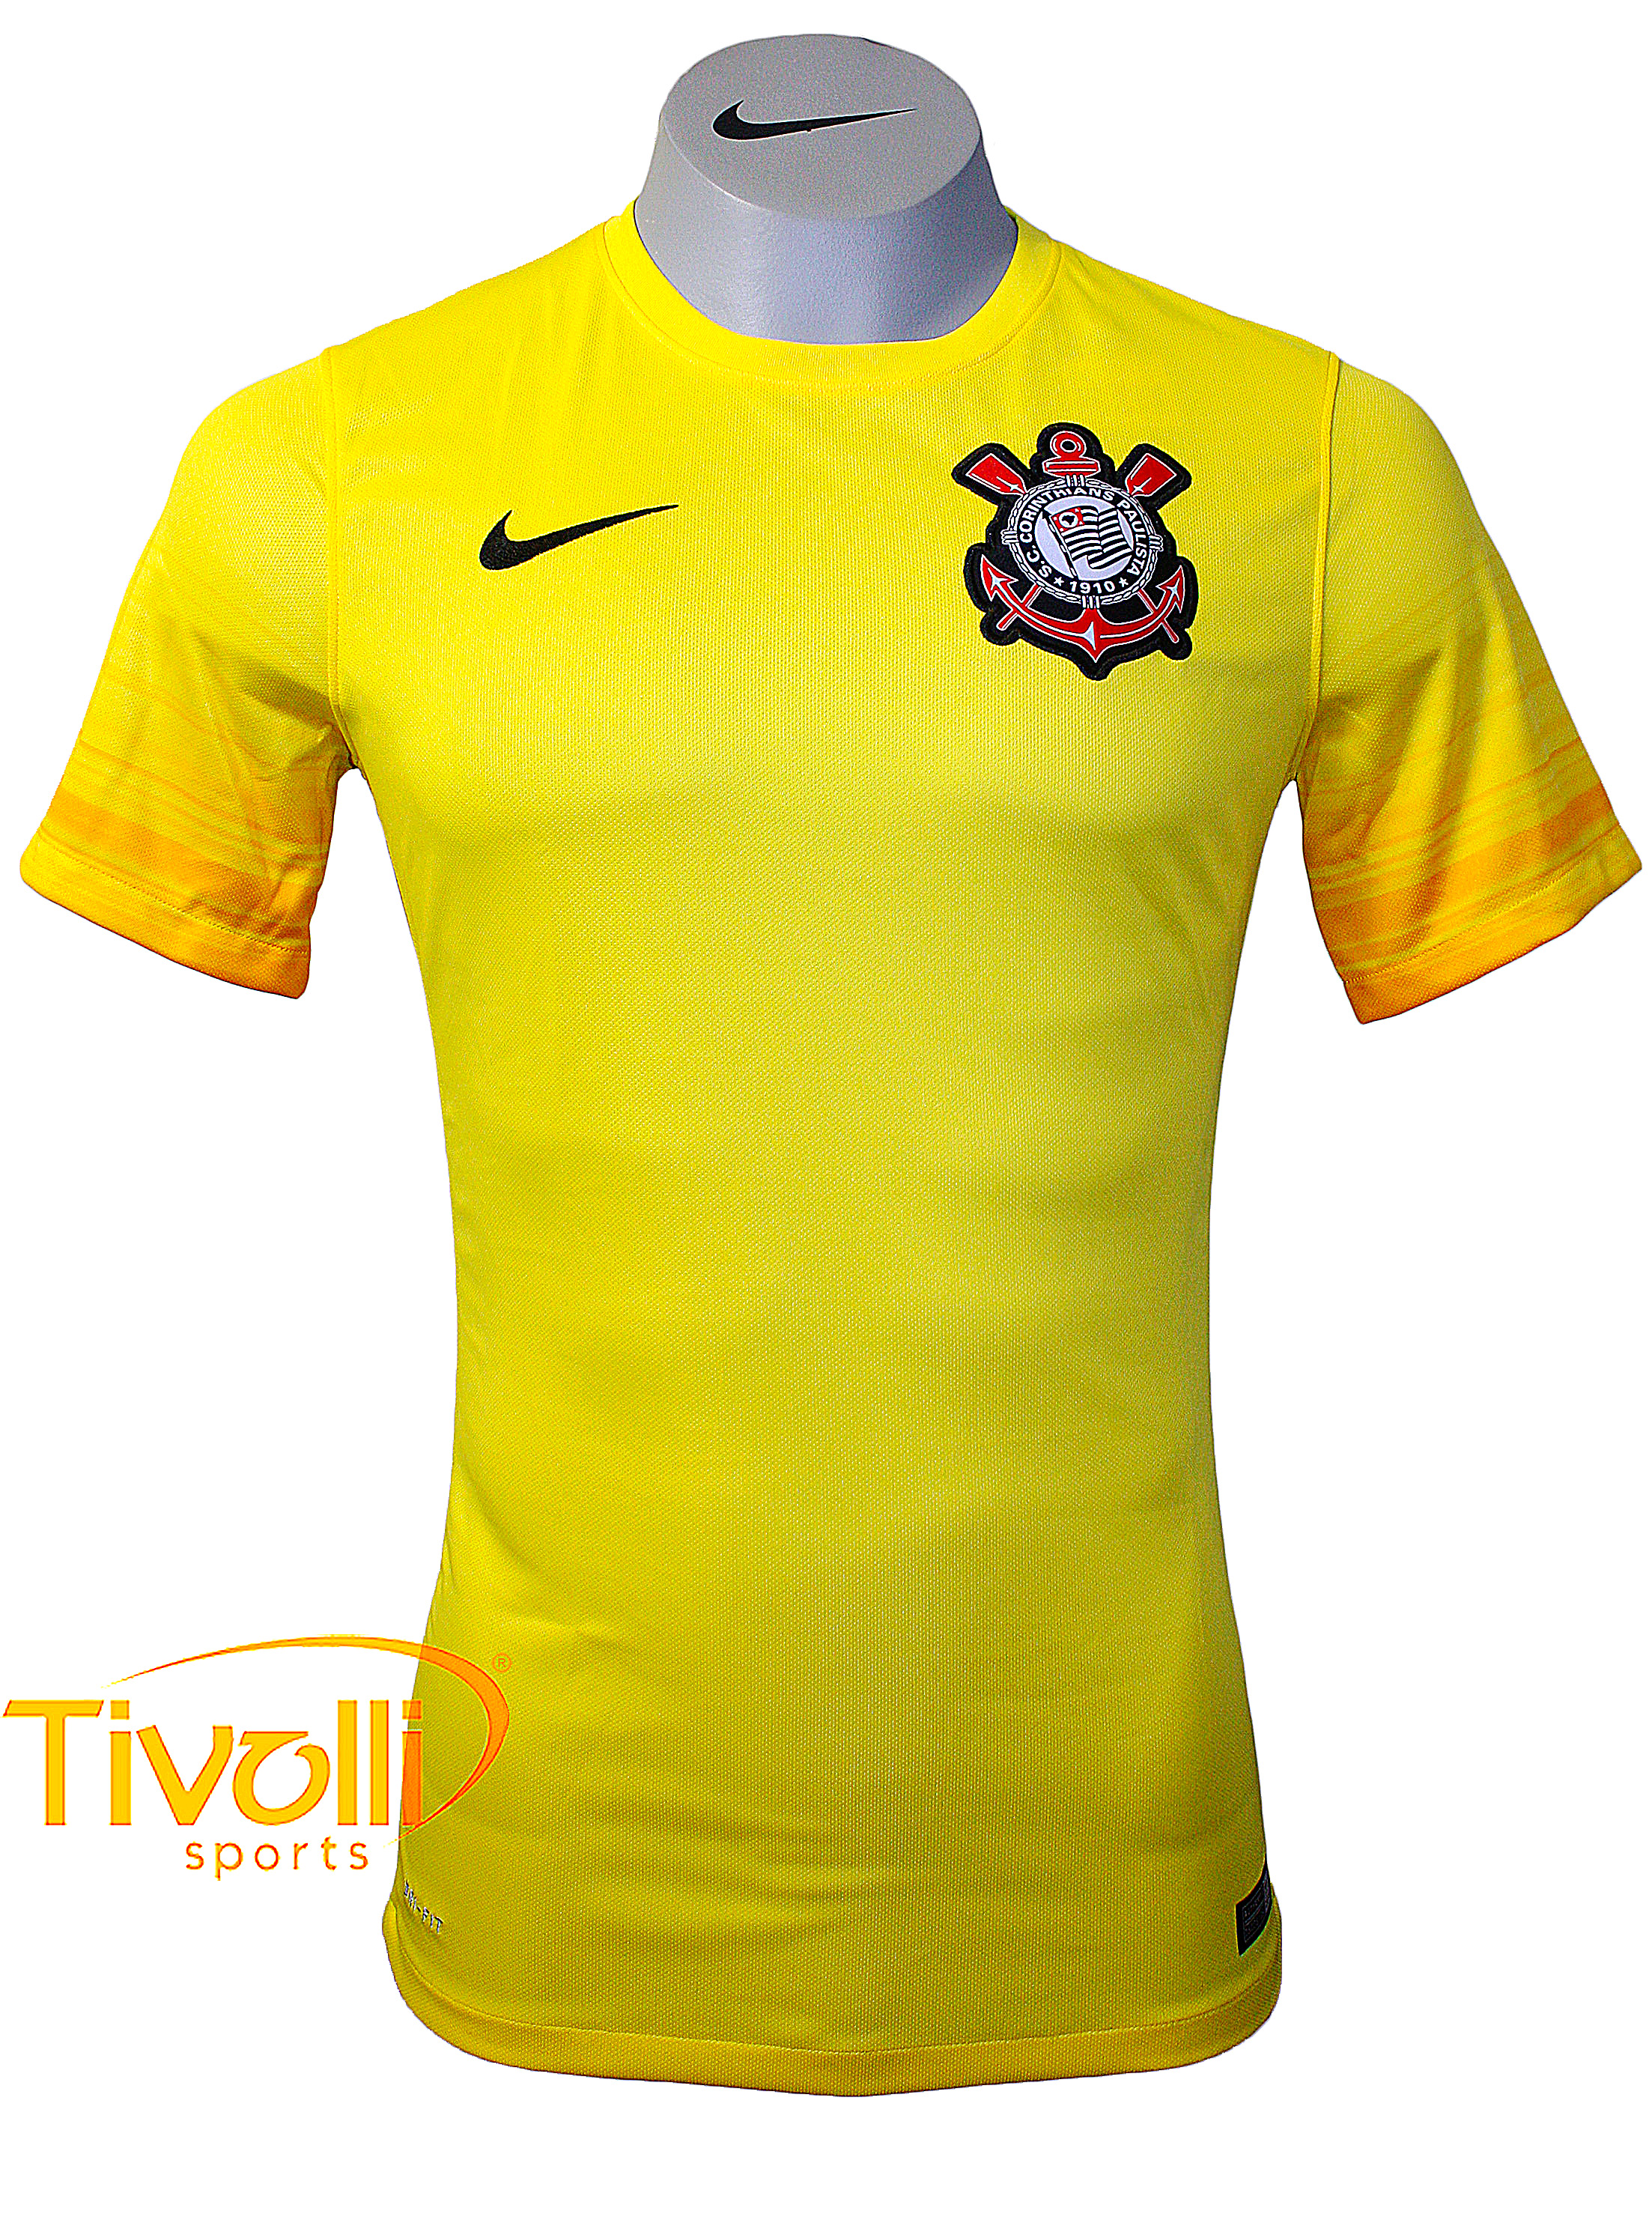 Black Friday - Camisa Corinthians goleiro Nike   adulto amarela   fd81868e20e